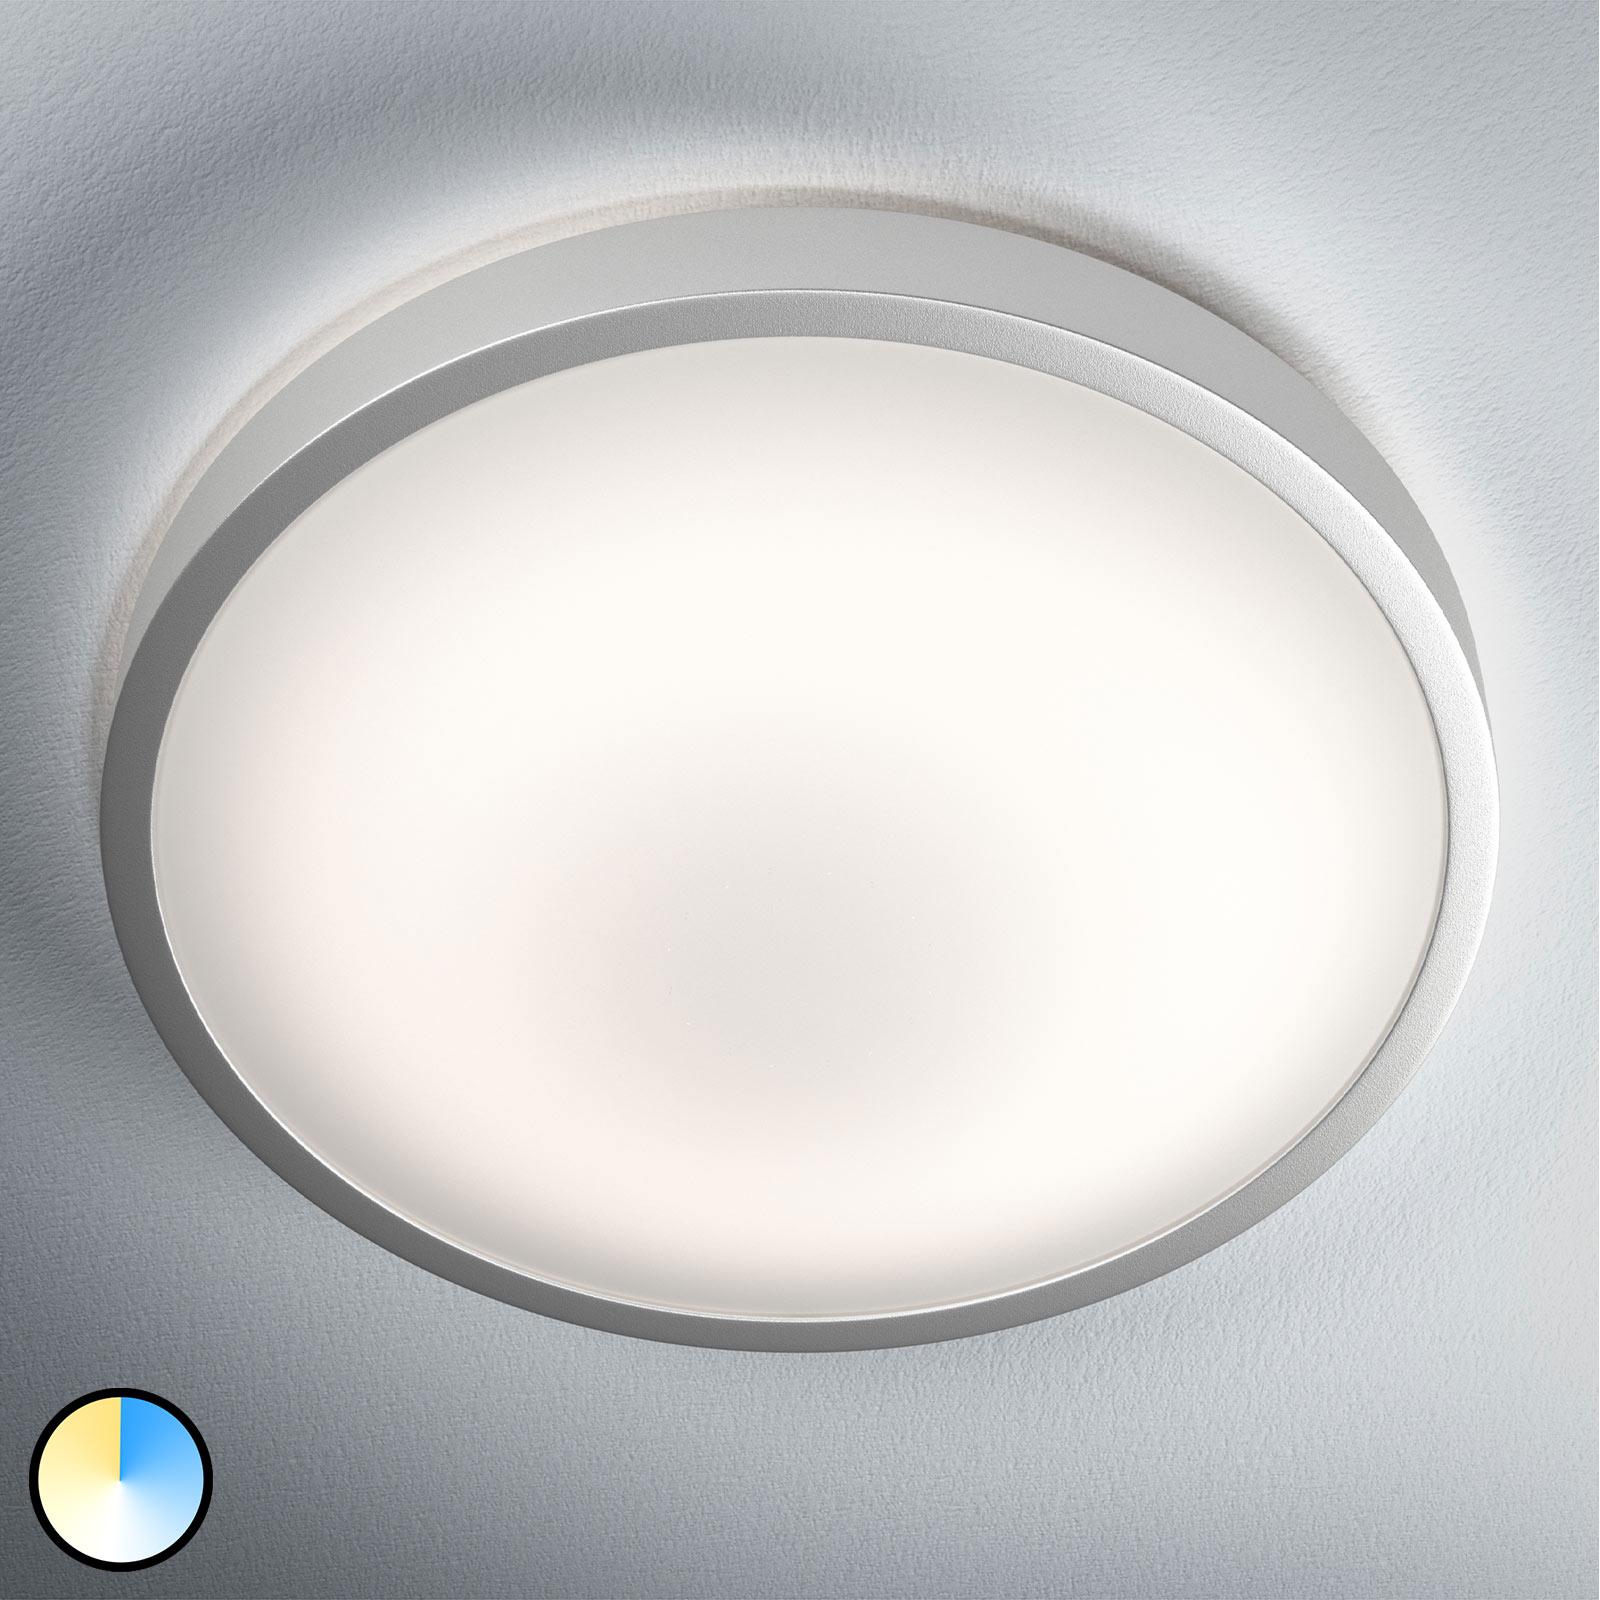 LEDVANCE Orbis lampa sufitowa LED 30 cm Click-CCT